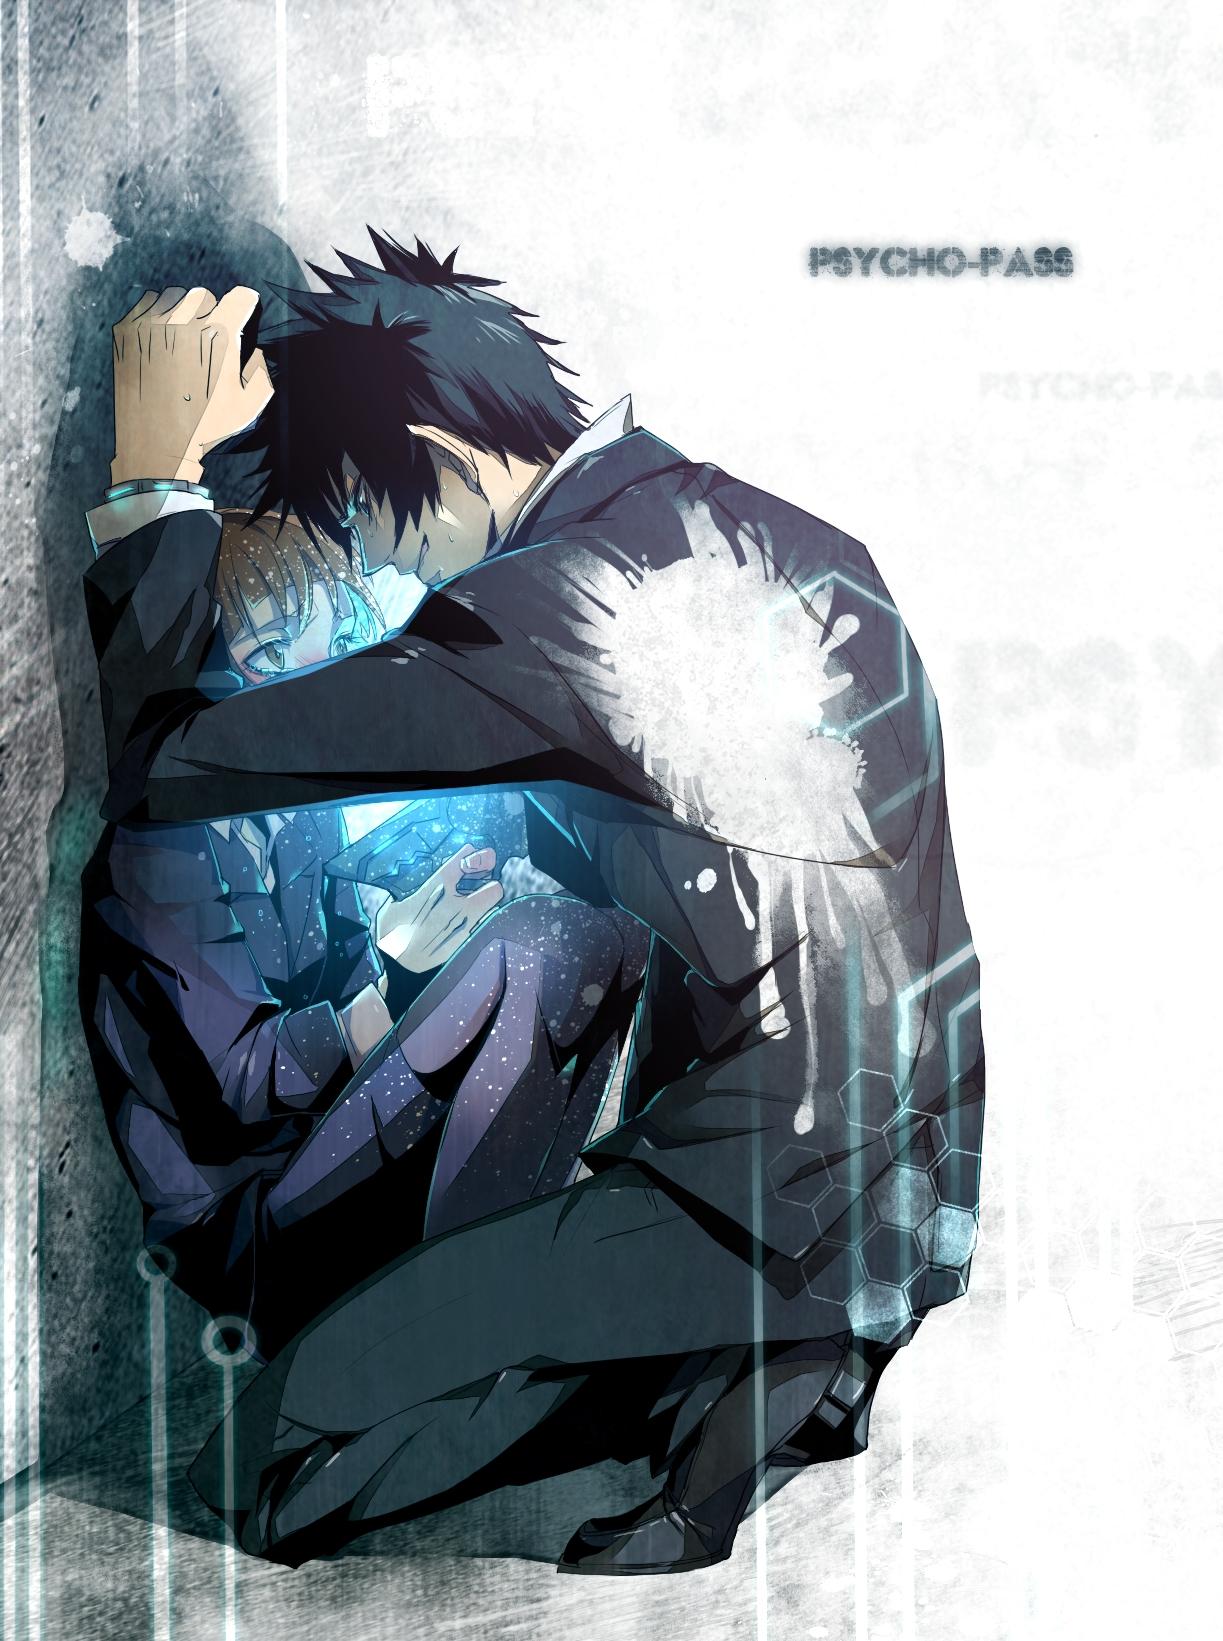 Psycho Pass Zerochan Anime Image Board